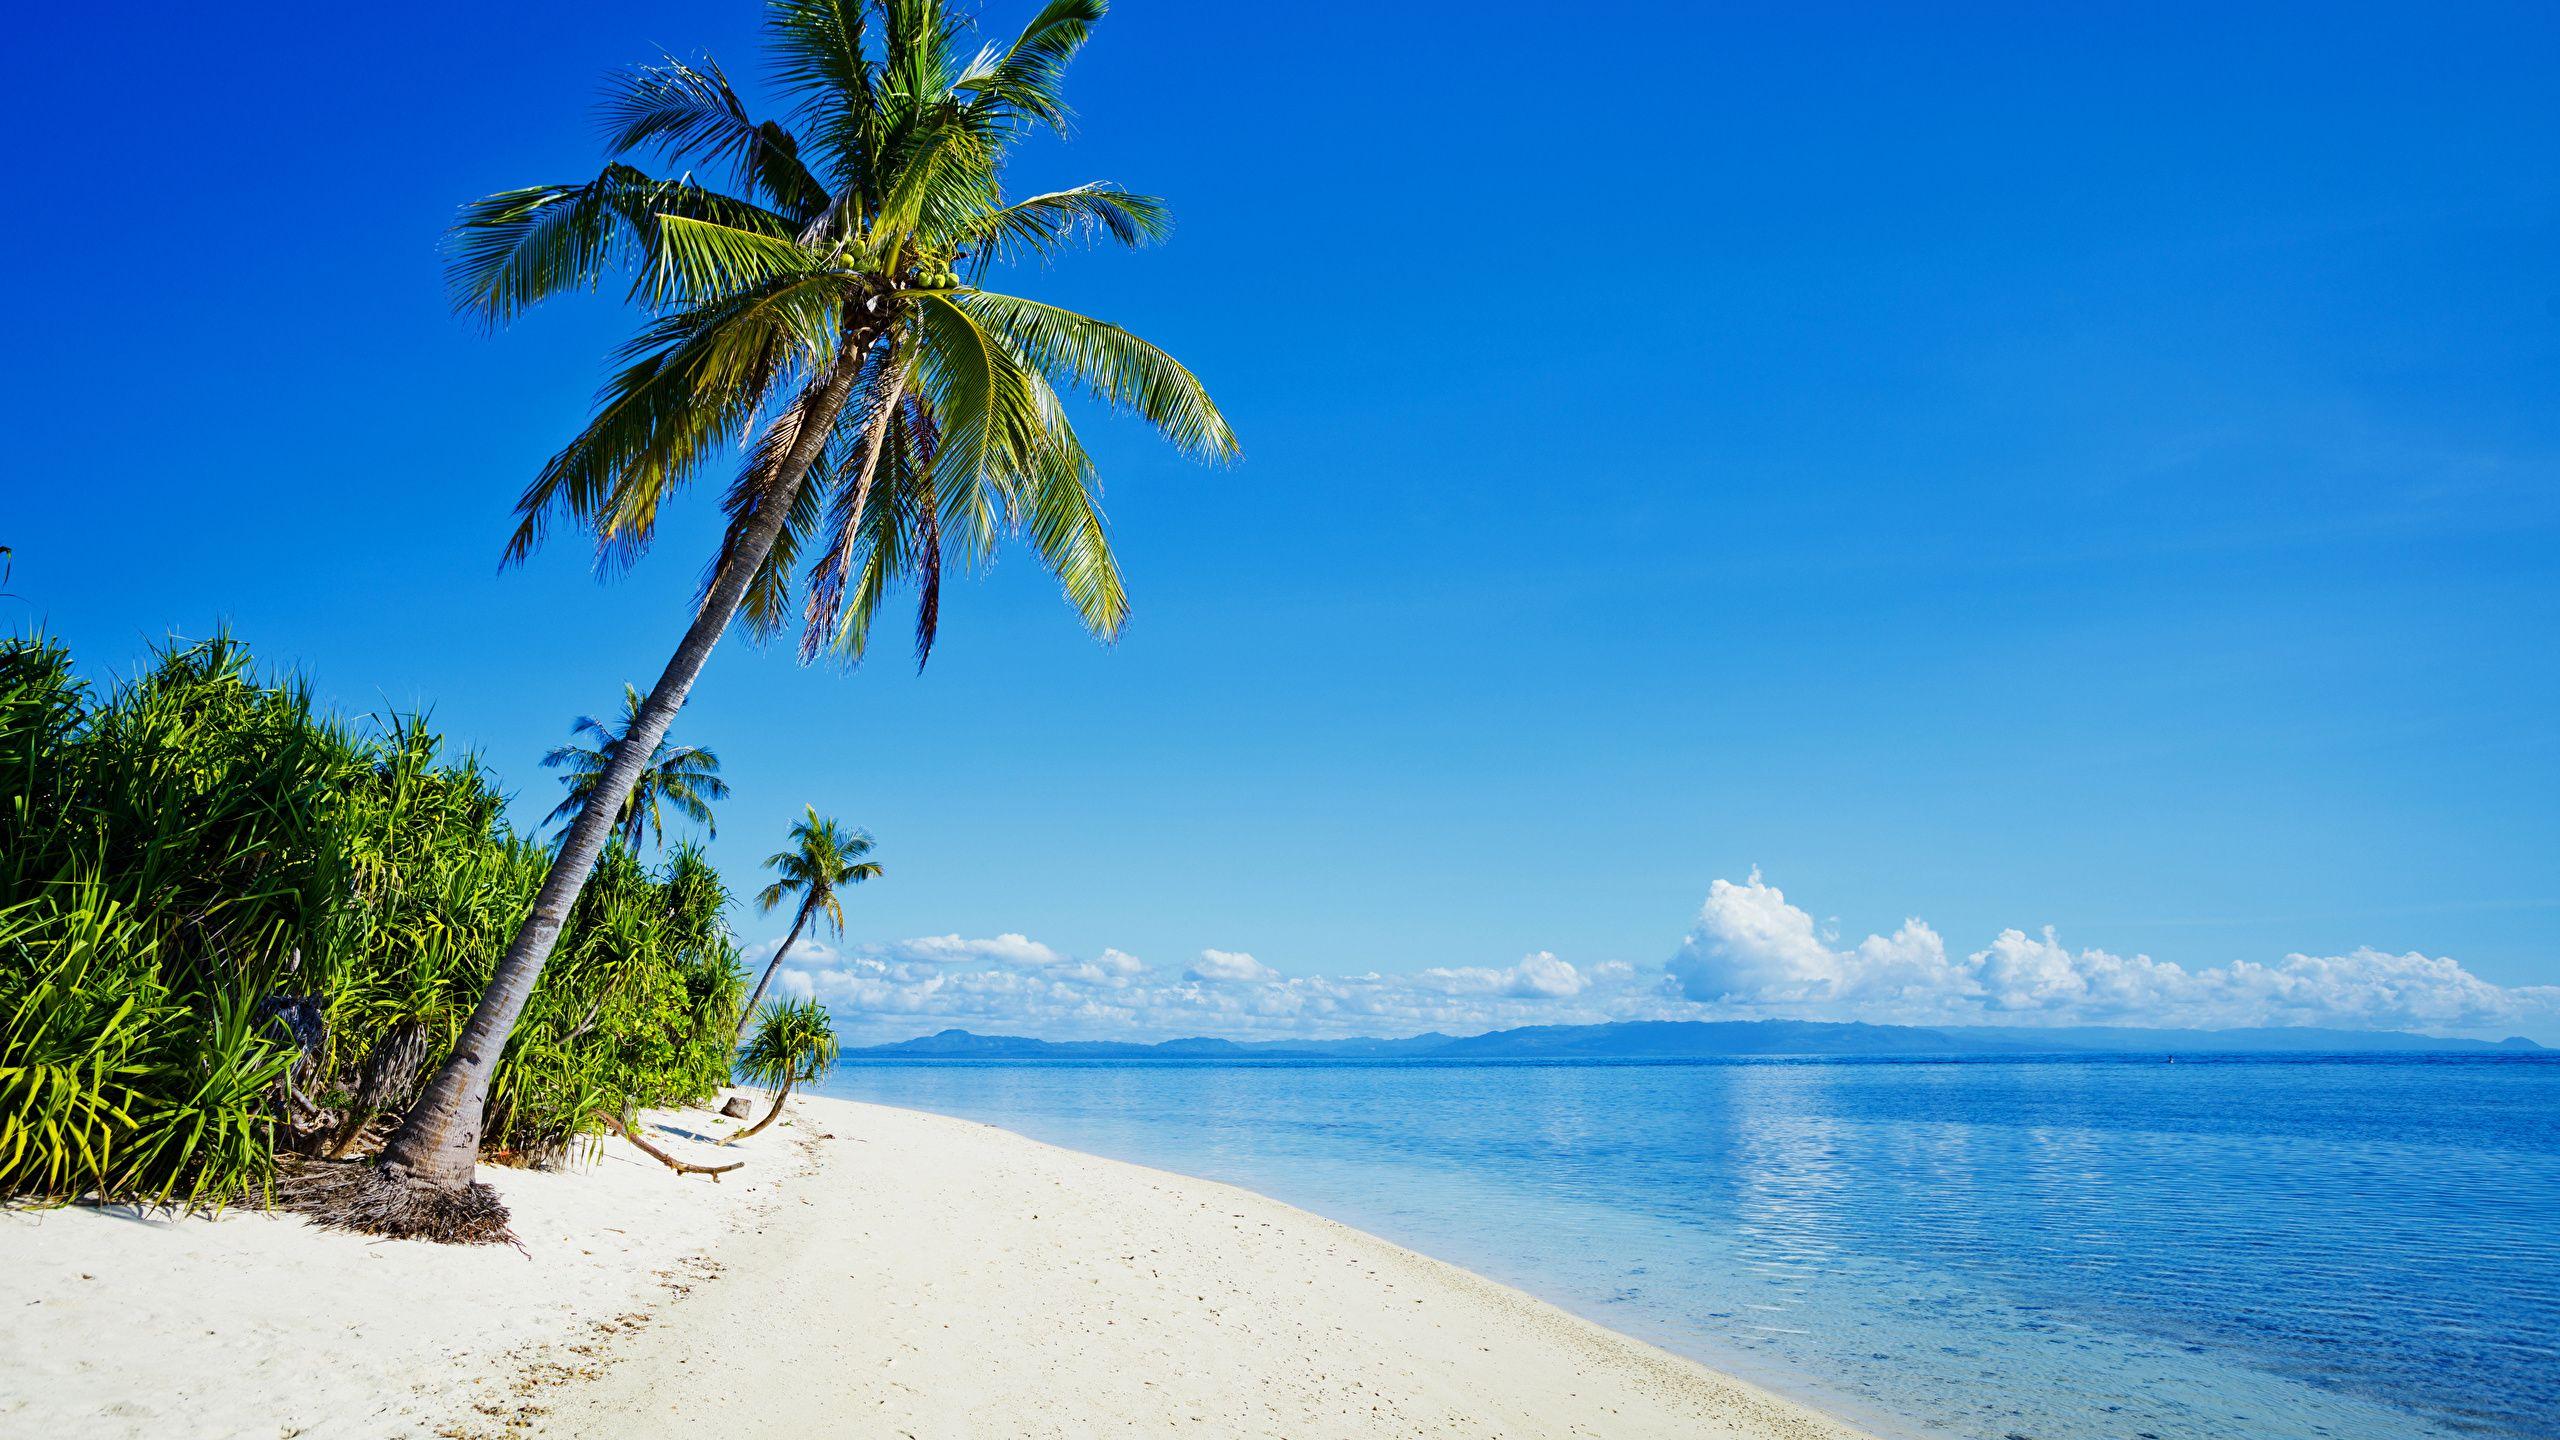 Beach Sands Palm Tree Sea Day Nature Waves Desktop Wallpaper Beach Sunset Wallpaper Philippines Beaches Beach Images